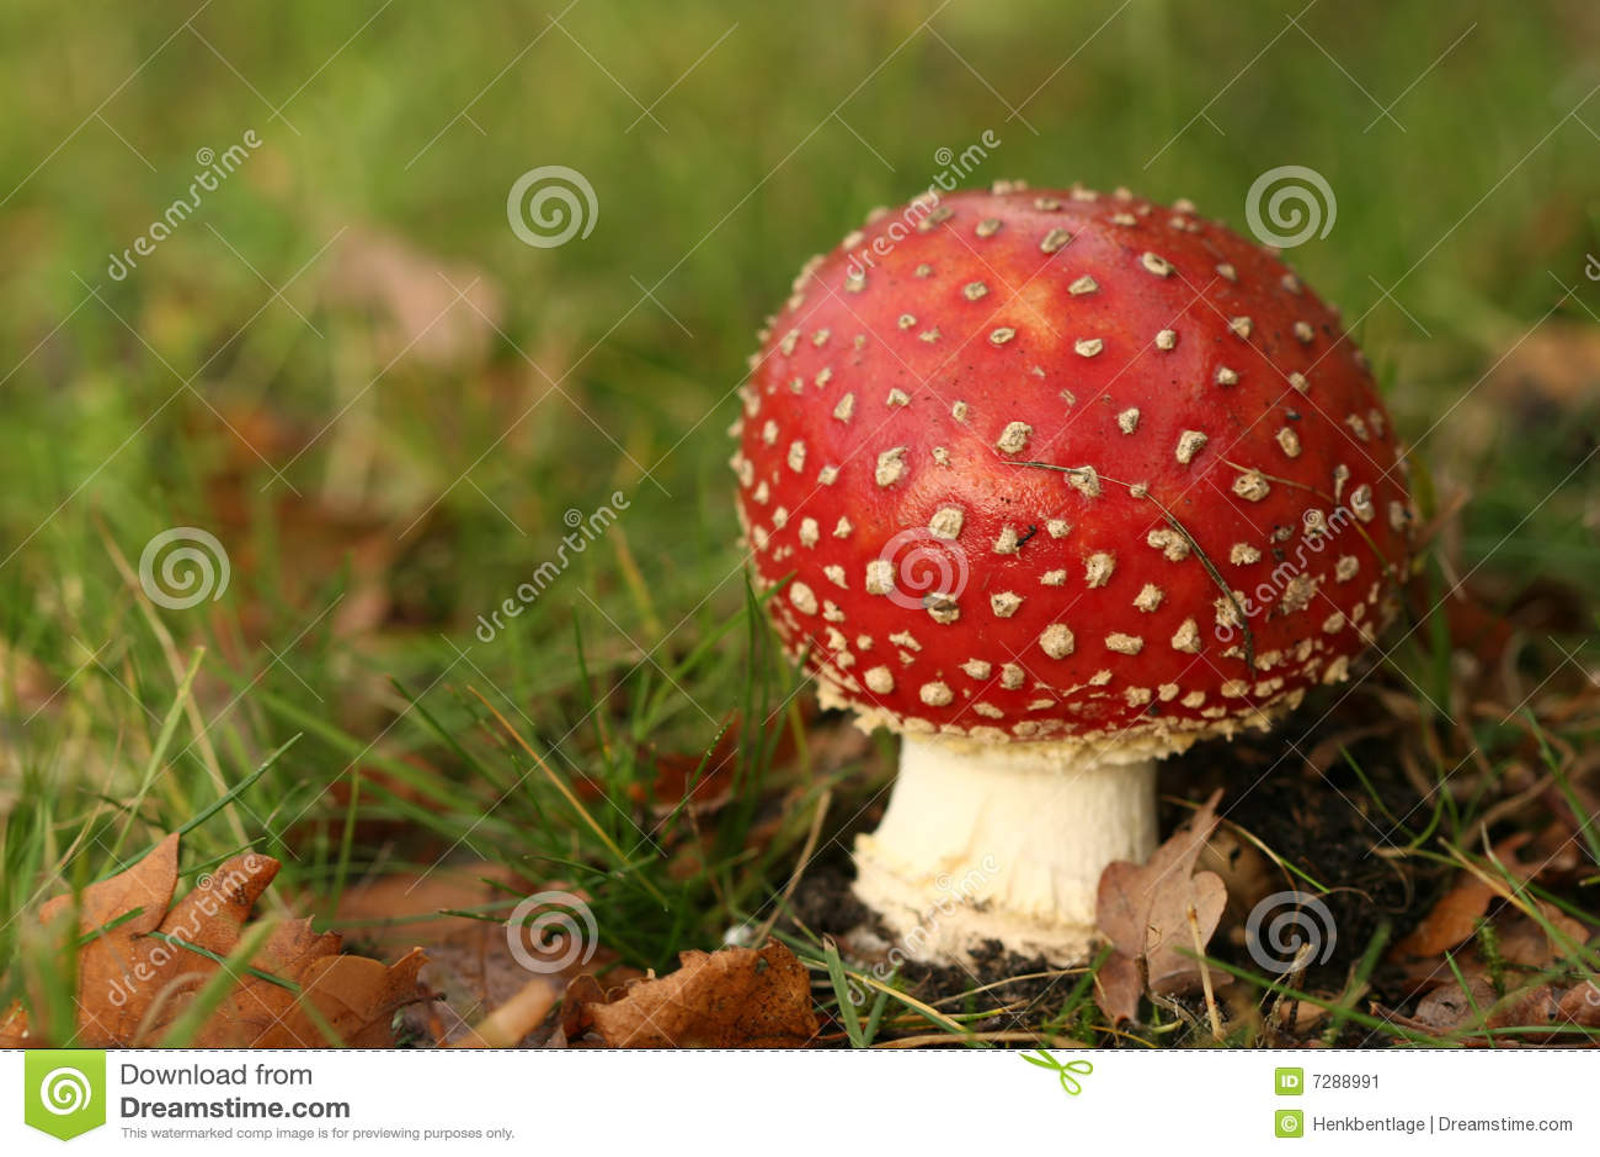 Escena del otoño: Toadstool